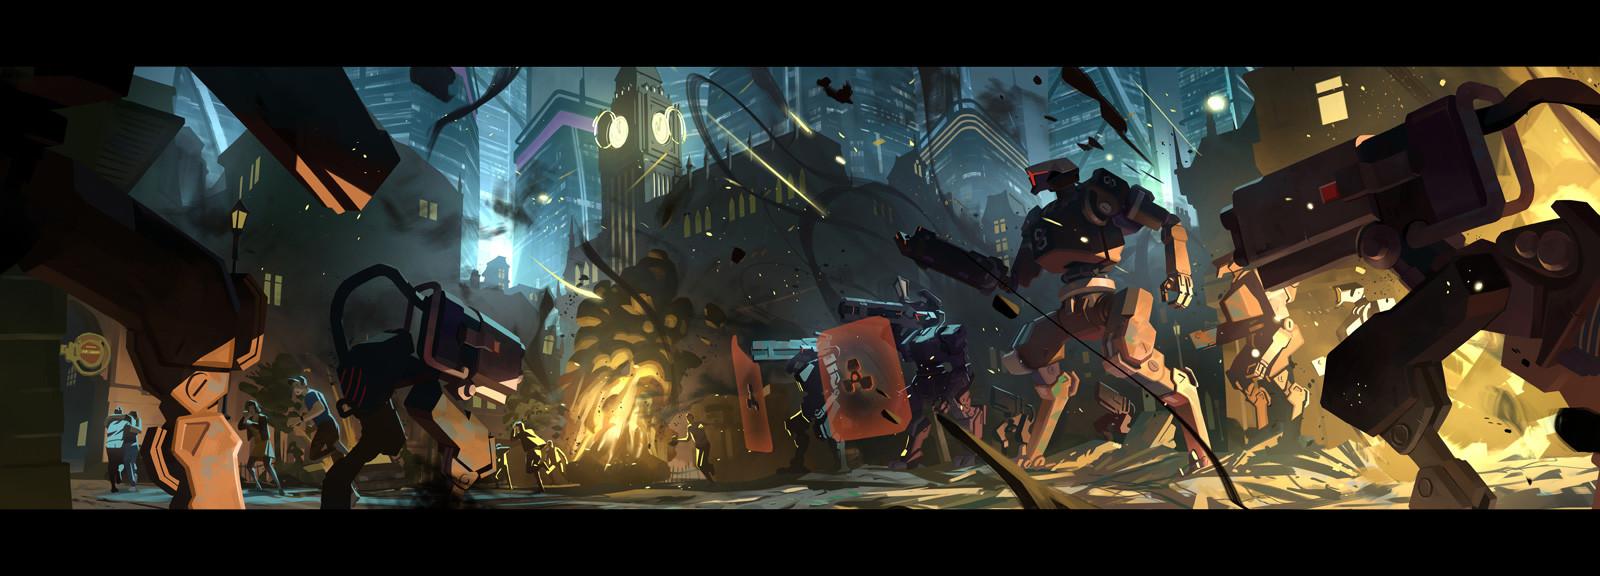 Nesskain Hks Overwatch King S Row Uprising